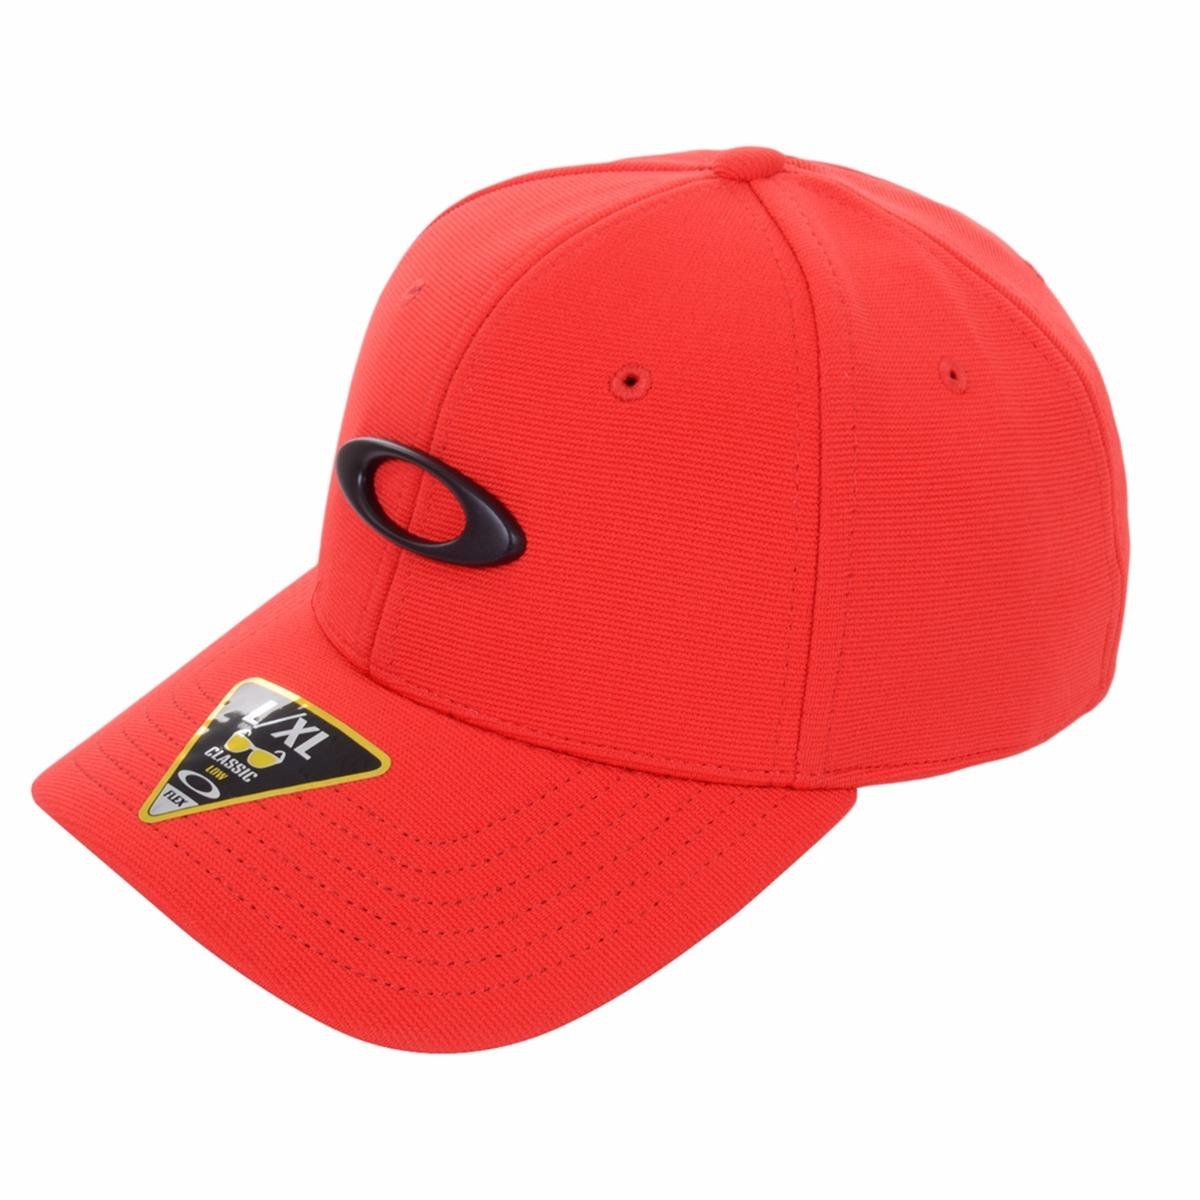 37ea15b049128 boné oakley tincan cap vermelho s m 57cm aba curva original. Carregando  zoom.